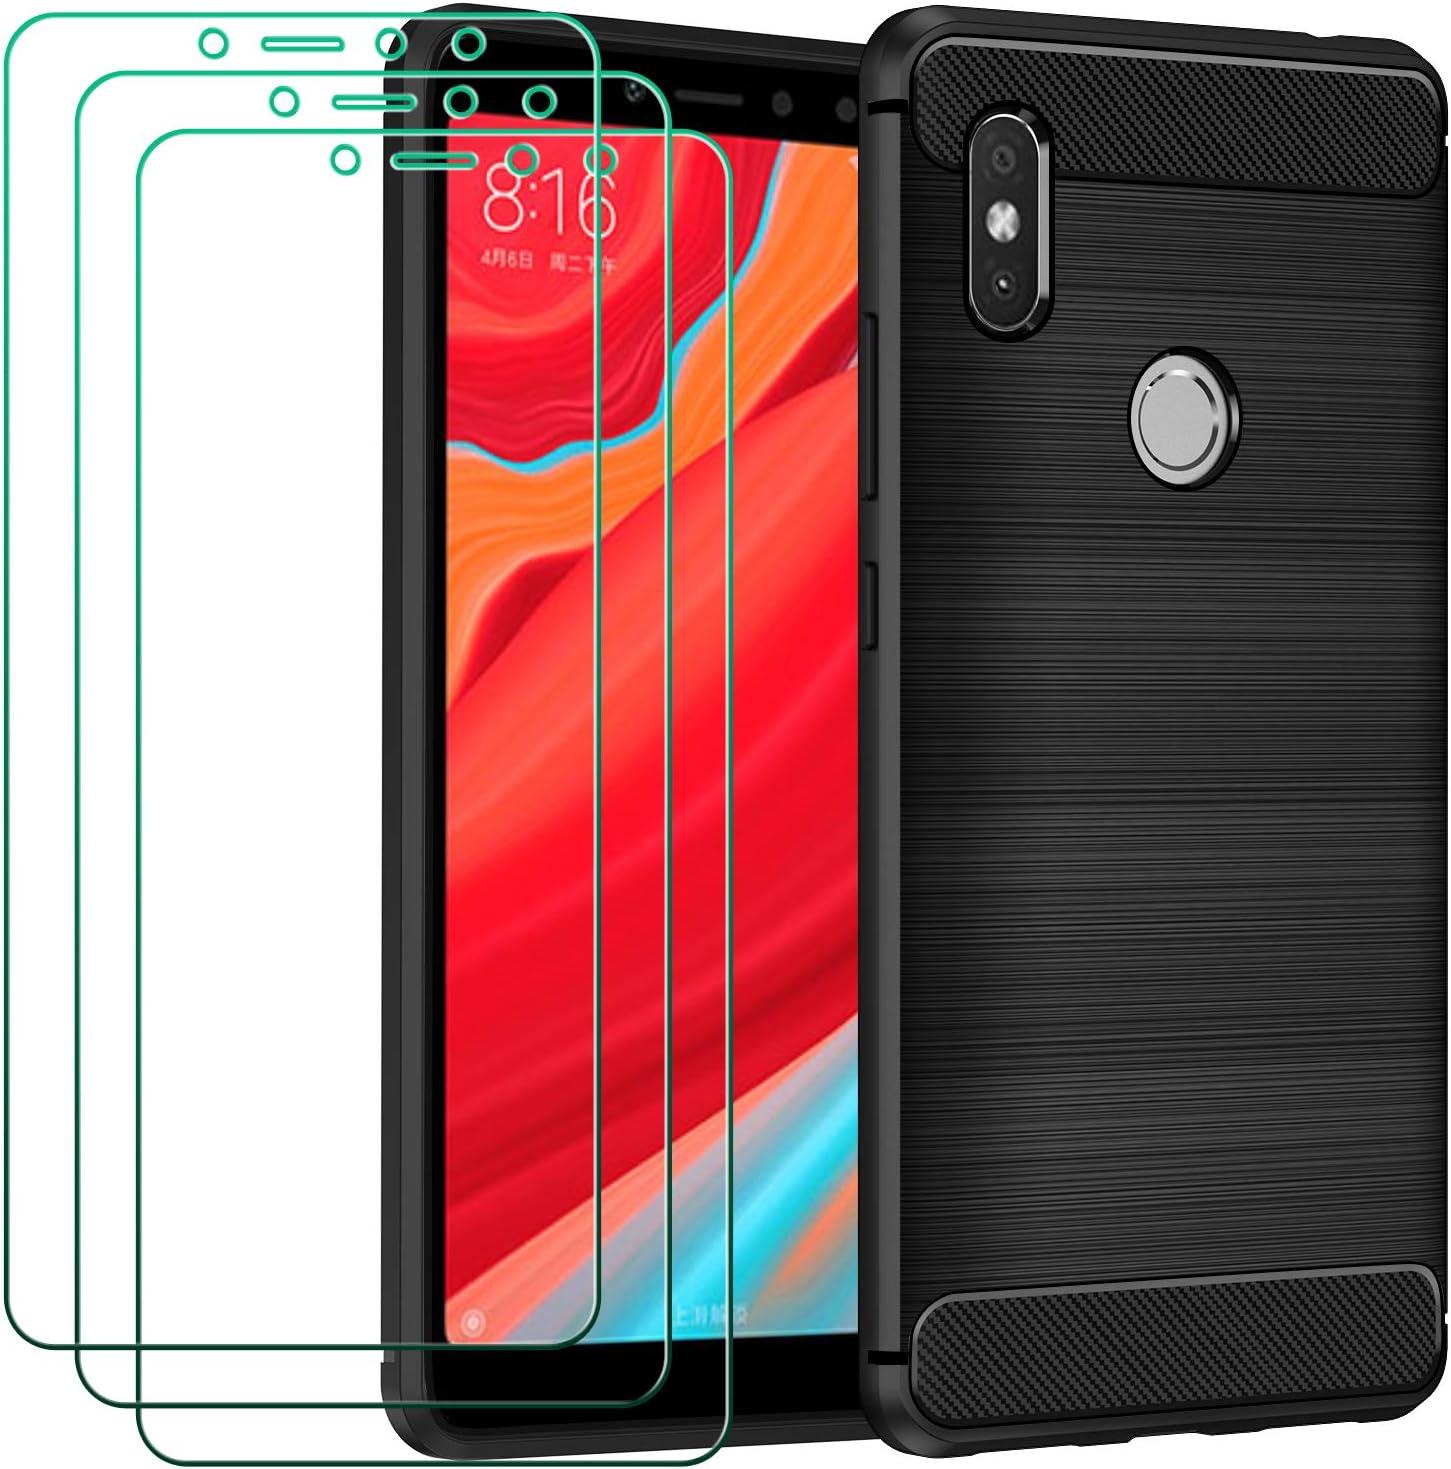 ivoler Funda para Xiaomi Redmi S2 + 3 Unidades Cristal Templado, Fibra de Carbono Negro TPU Suave de Silicona [Carcasa + Vidrio Templado] Ultra Fina Caso y Protector de Pantalla